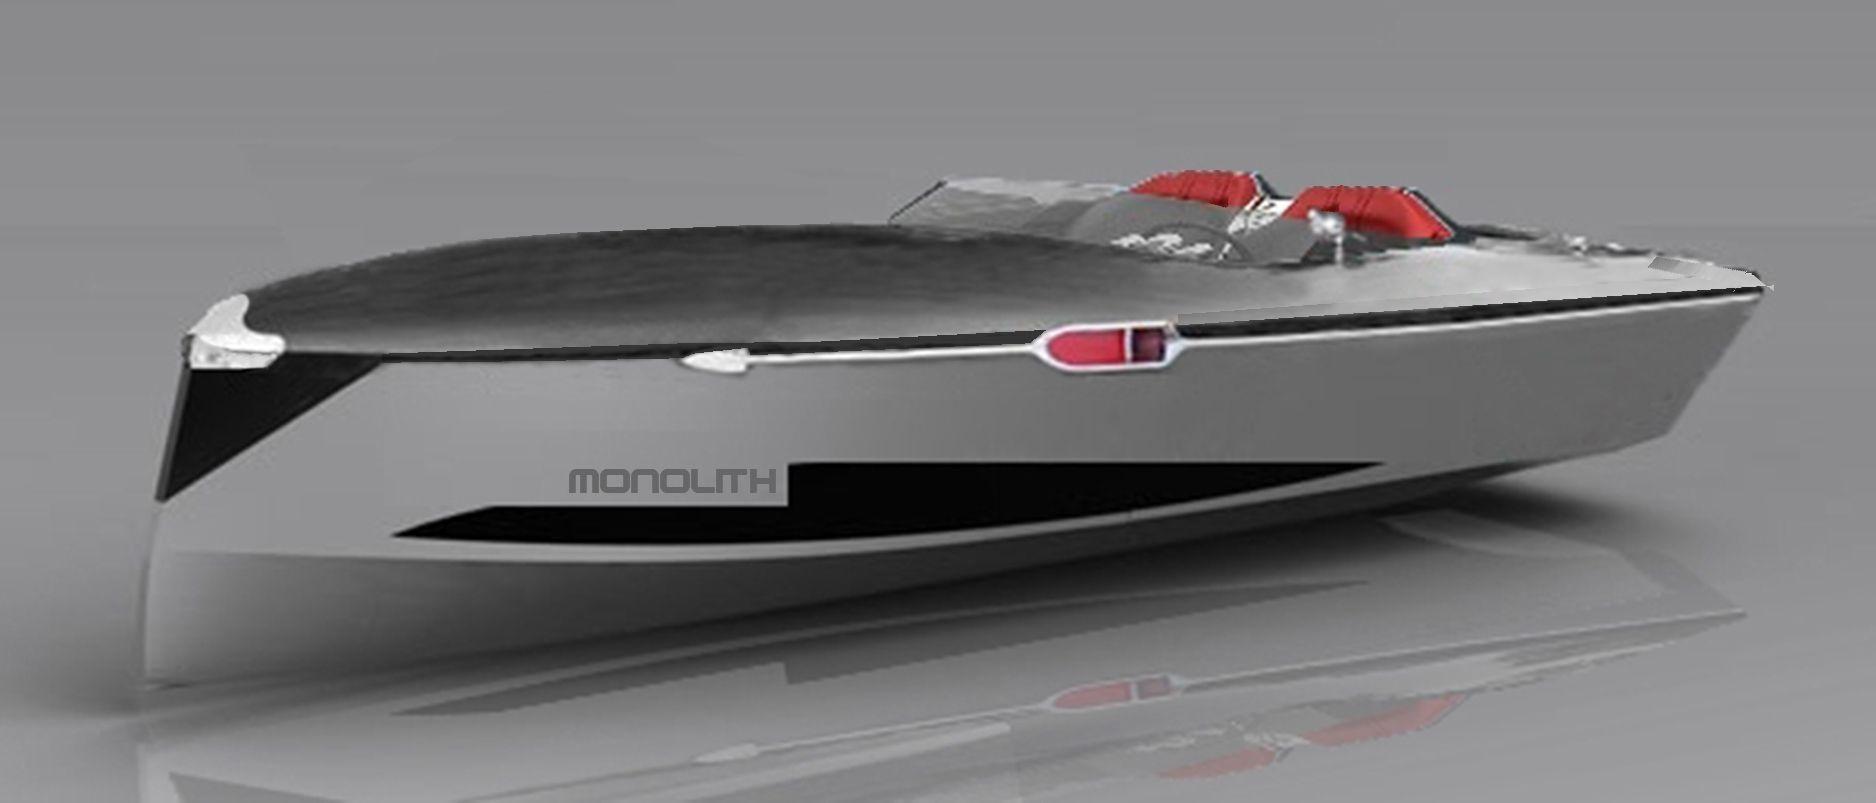 Speed Boat Boat Design Motor Boat Design Motor Boat Concept